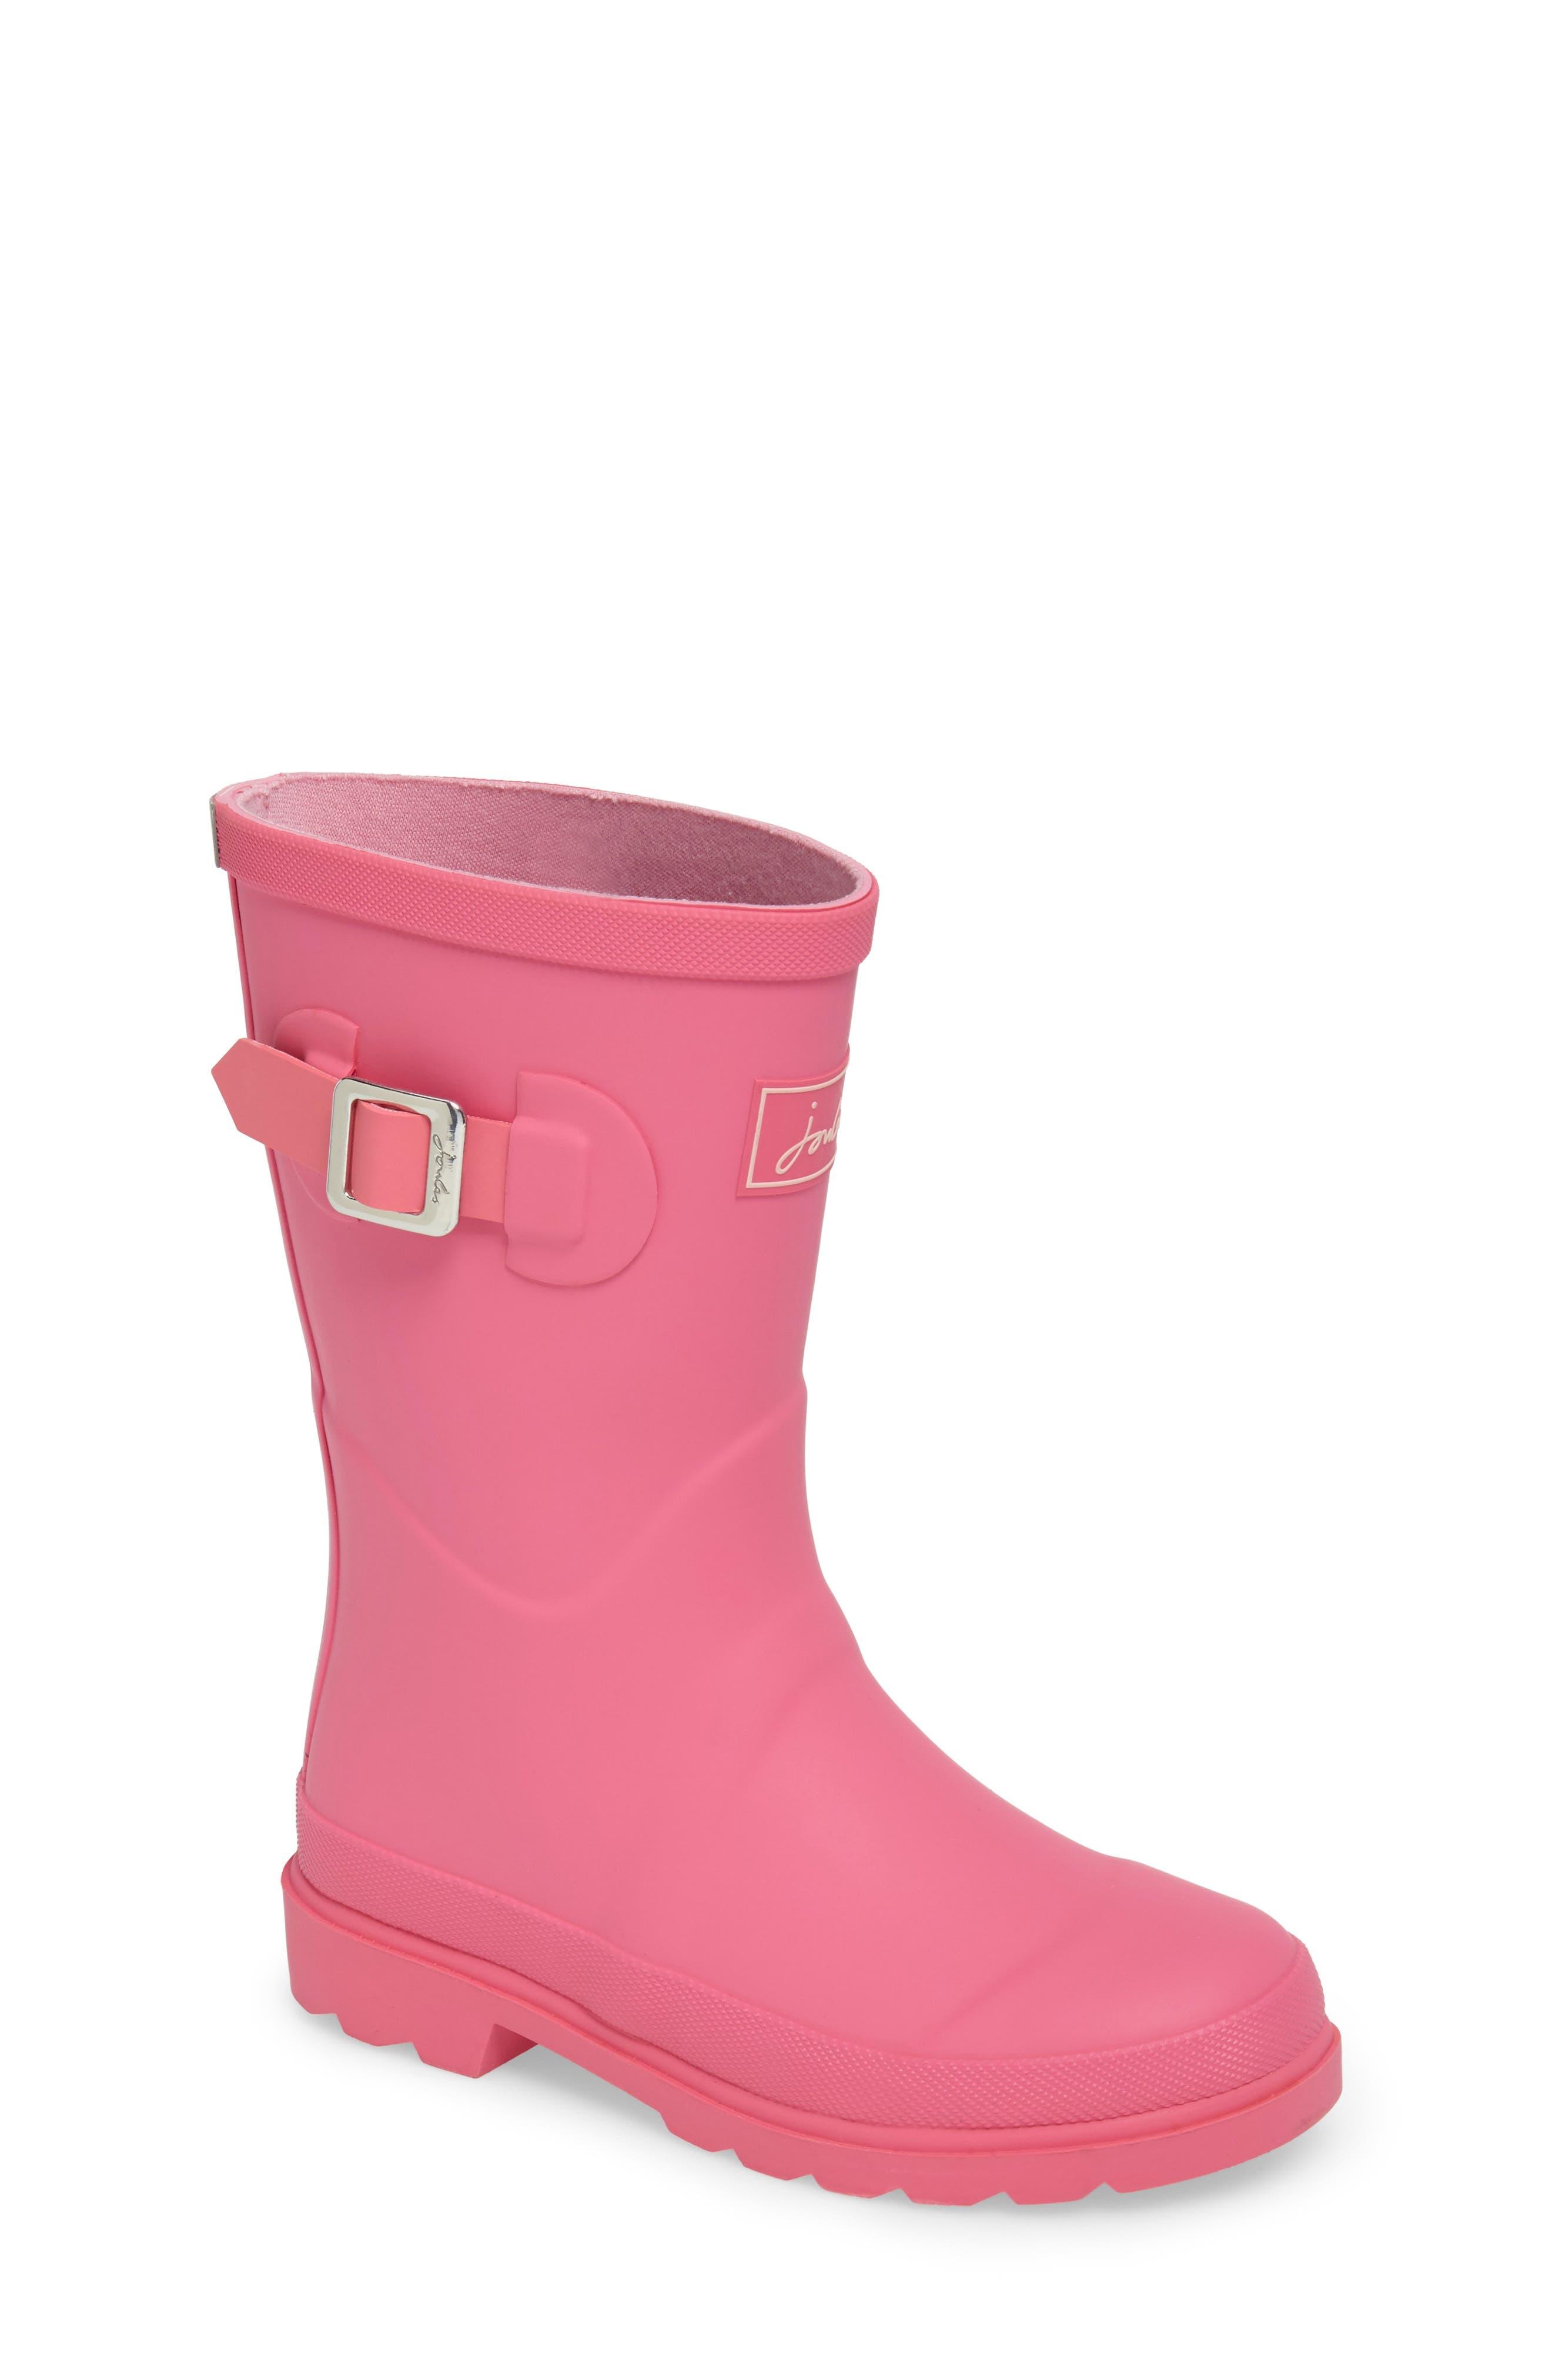 Joules Welly Matte Waterproof Rain Boot (Toddler, Little Kid & Big Kid)